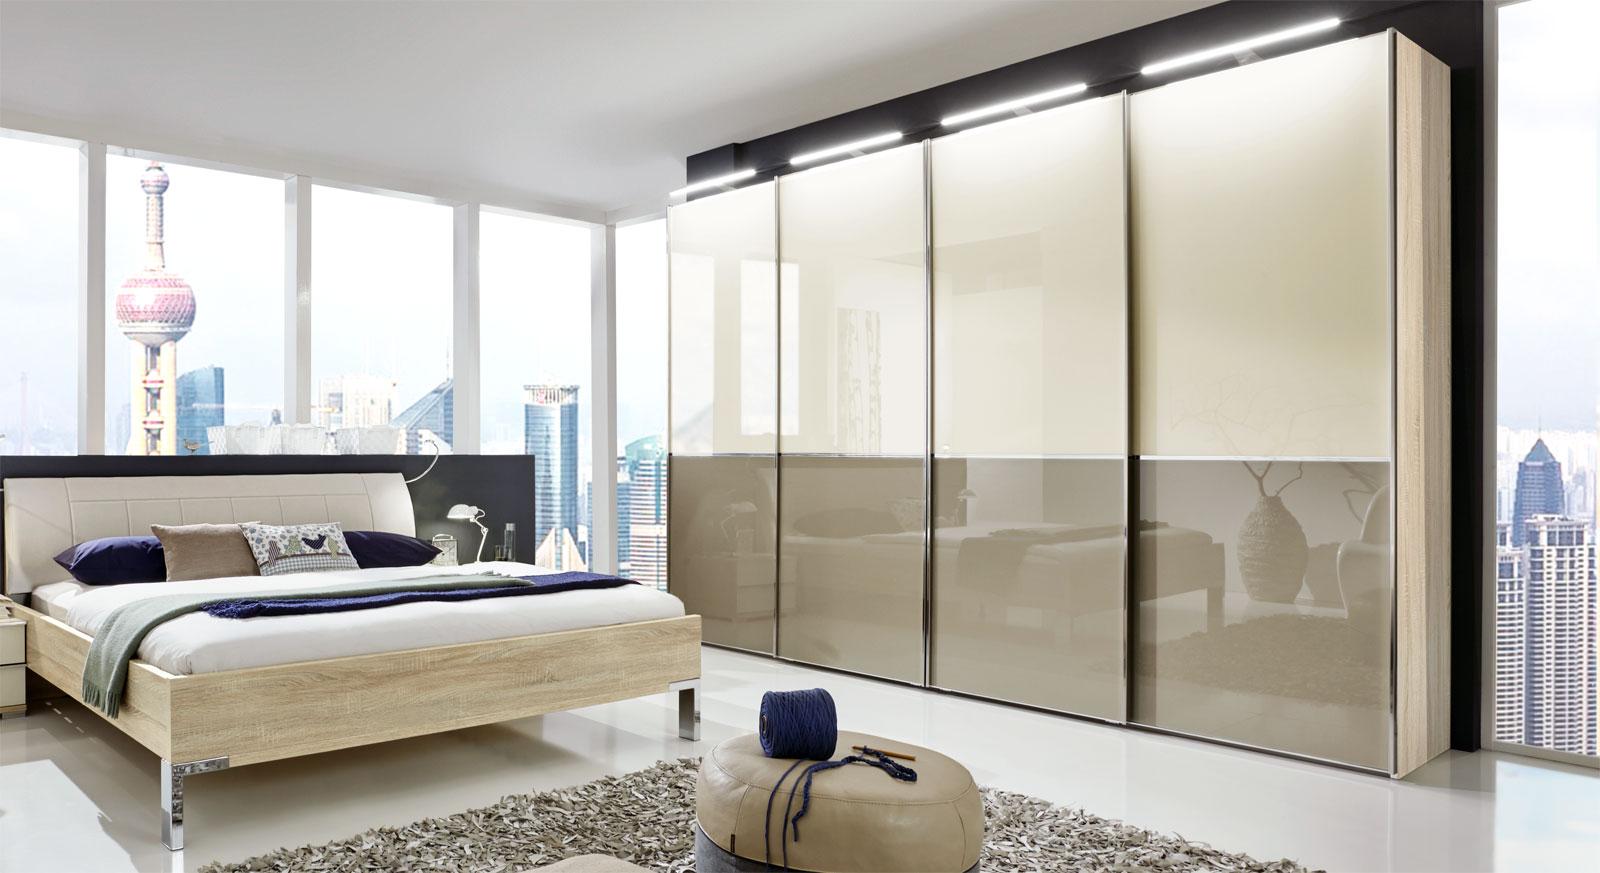 Schwebetürenschrank in Dekor mit Glasfront 2 bis 4 türig - Banga